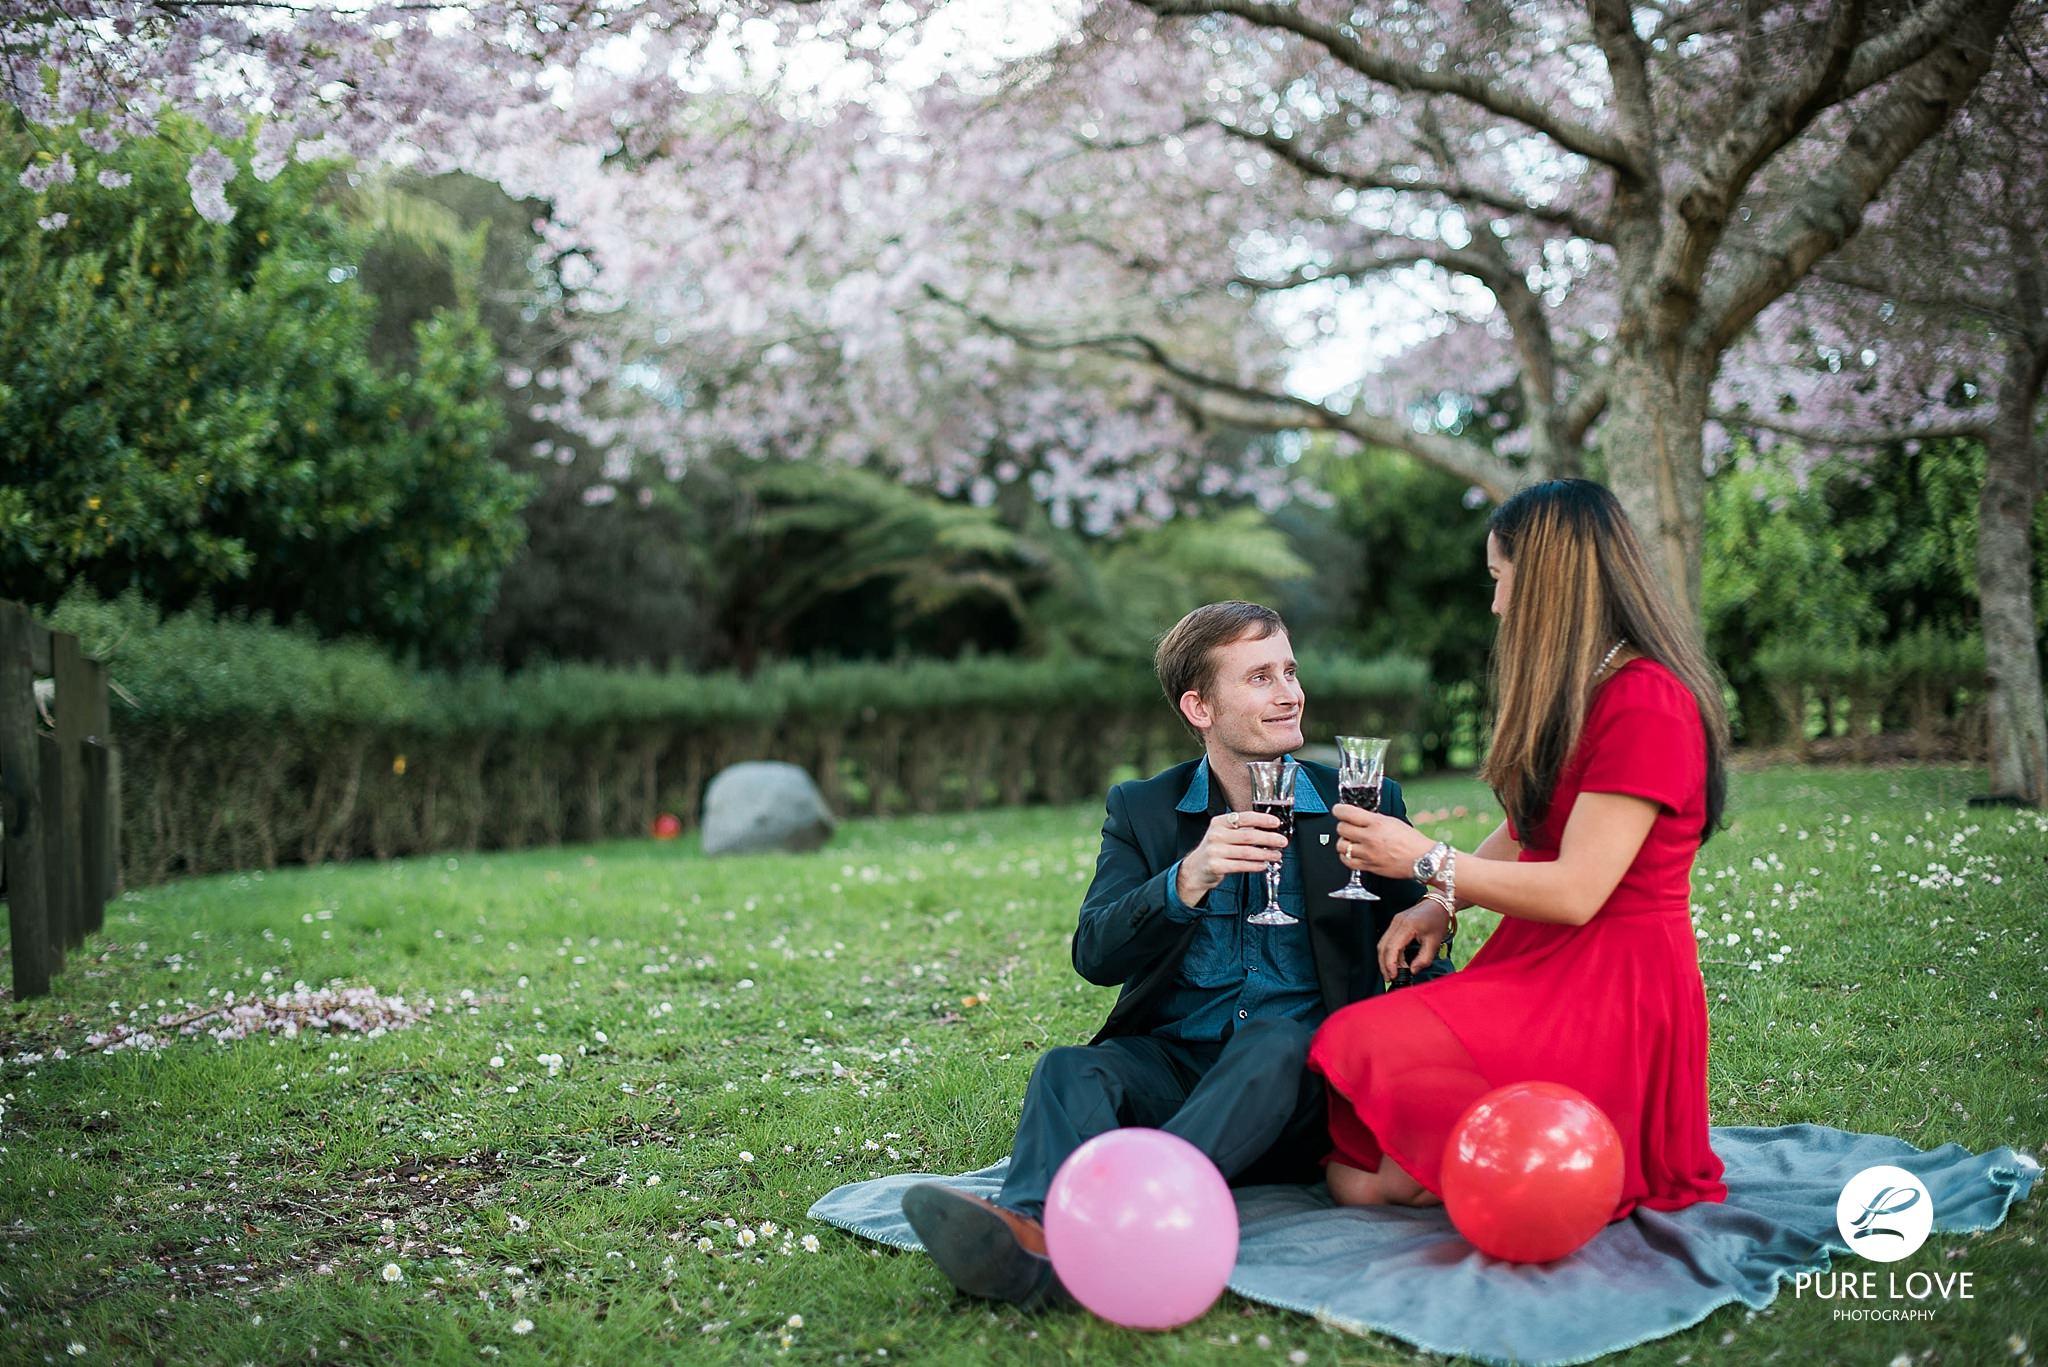 Cherry_Blossom_Engagement_Session_Rotorua99.jpg